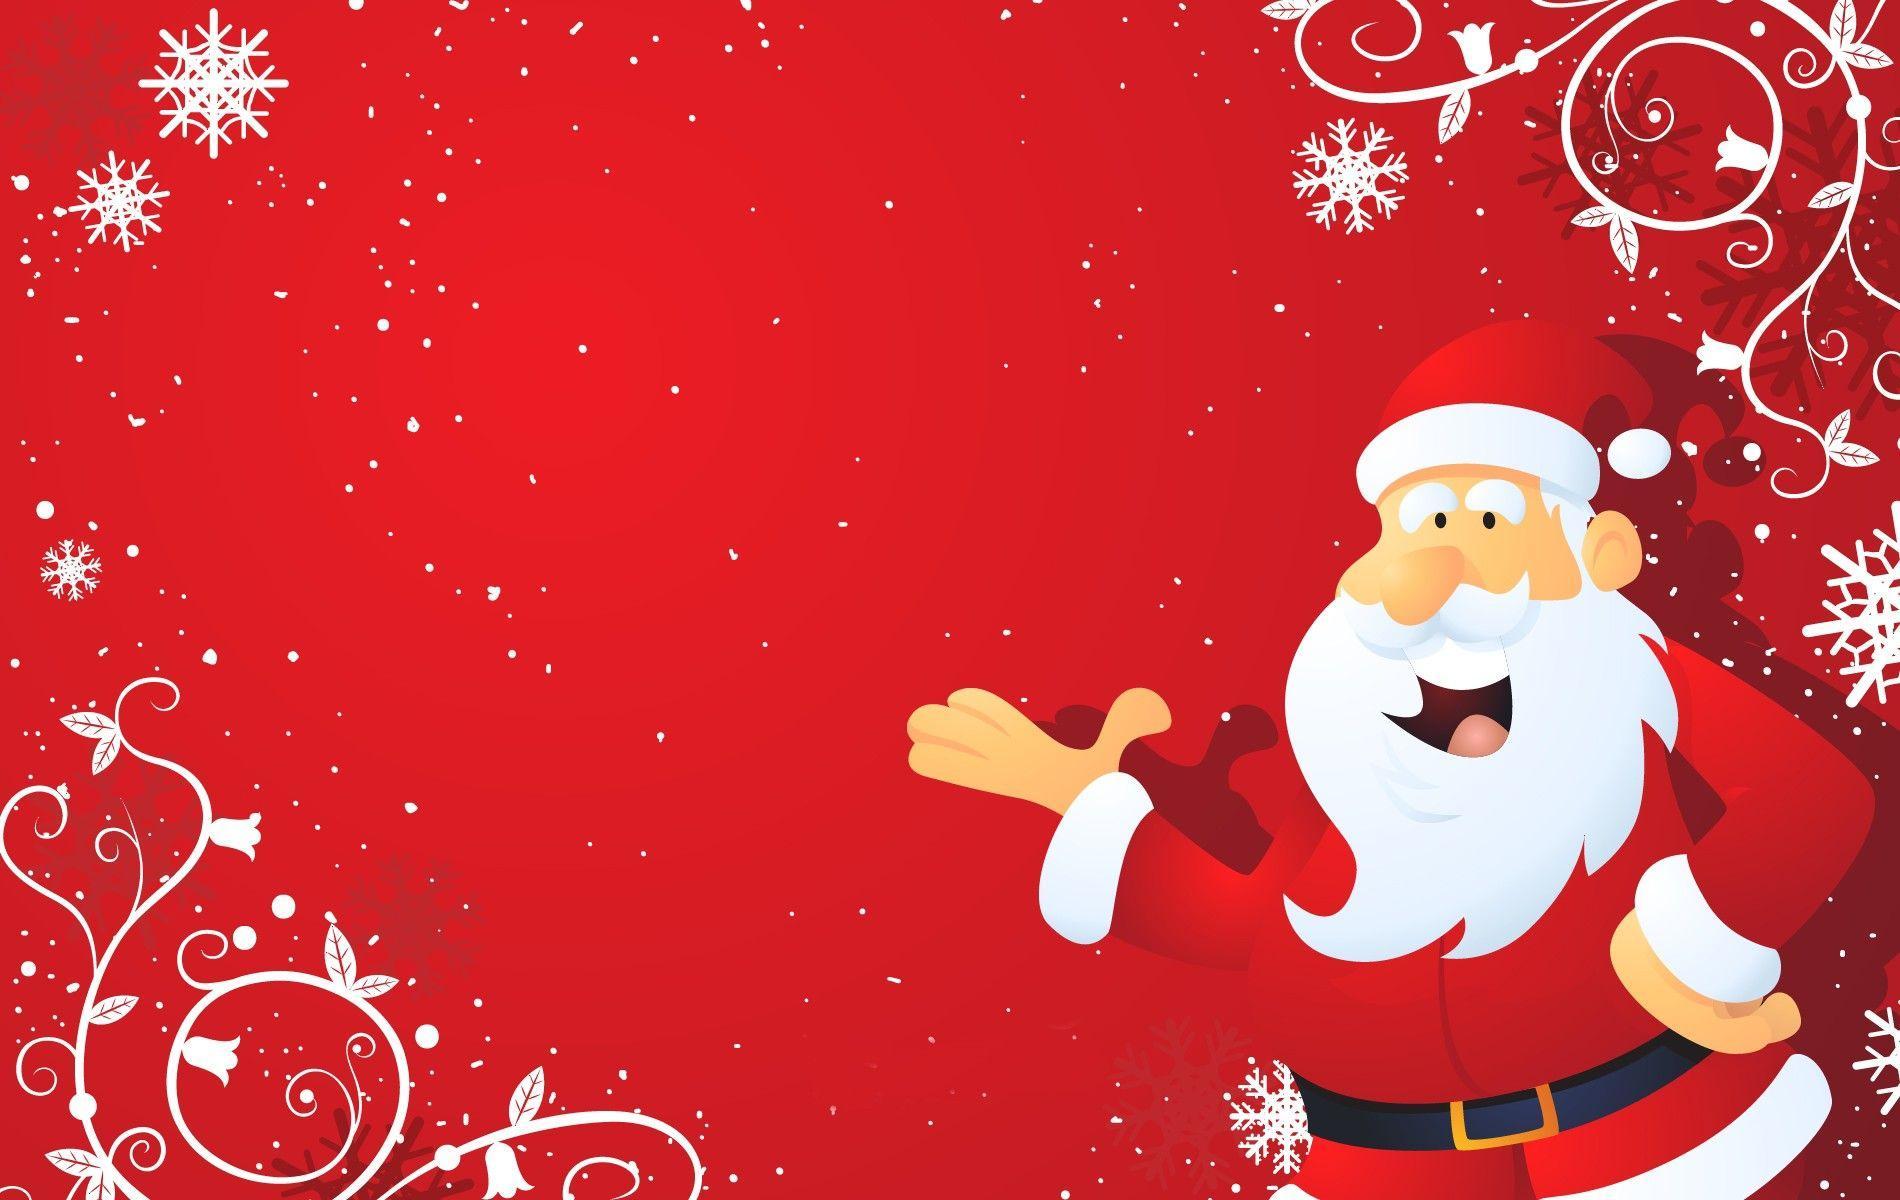 Christmas Images Free Cartoon.Christmas Cartoon Wallpapers Top Free Christmas Cartoon